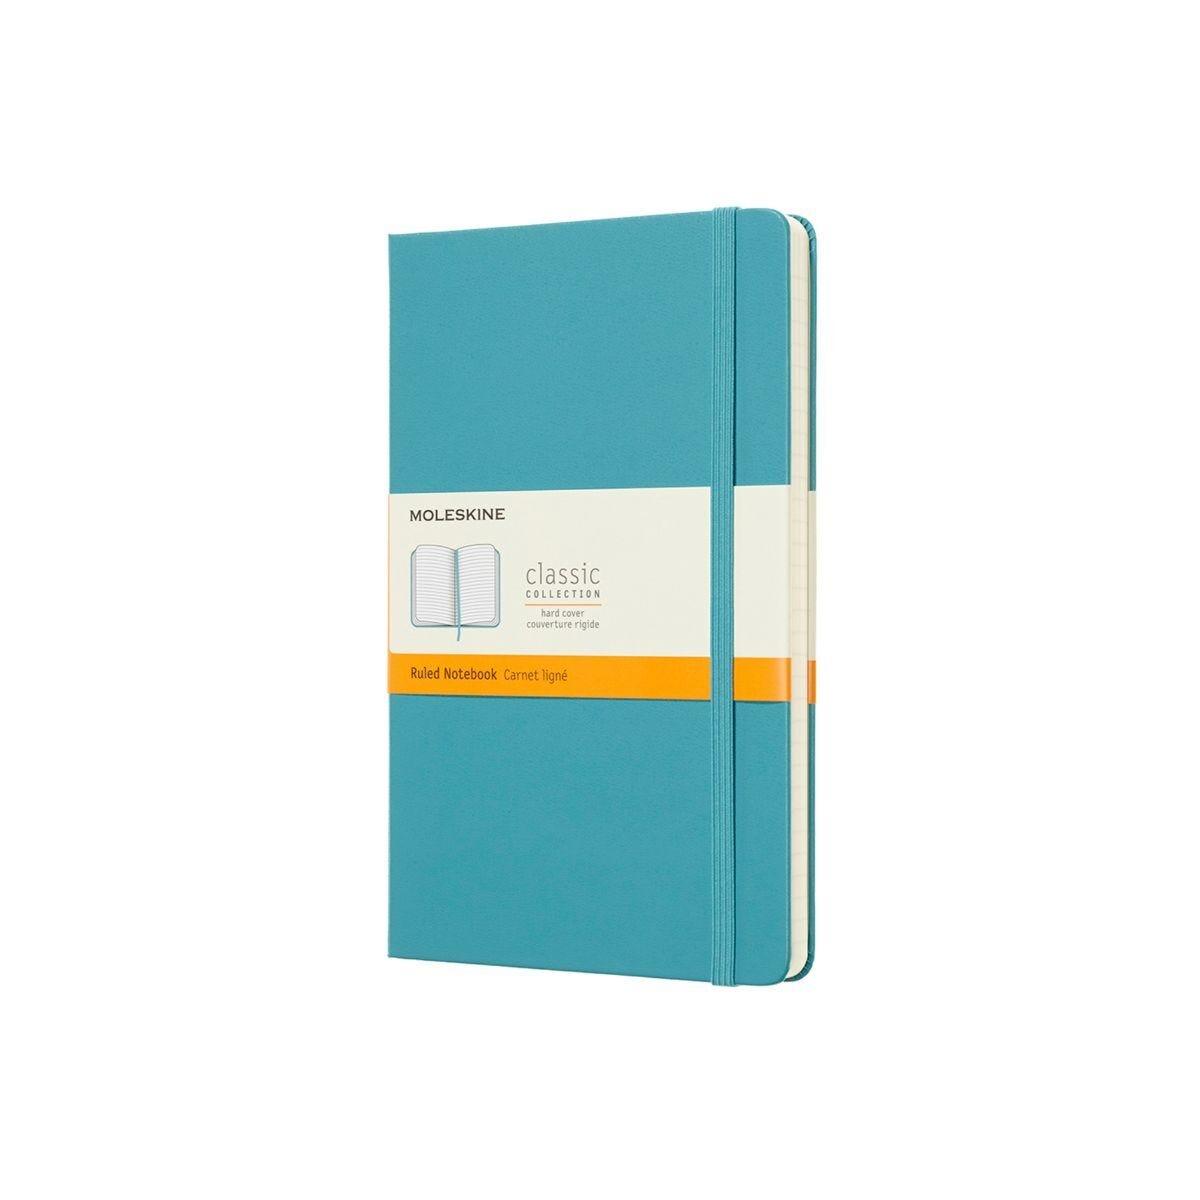 Moleskine Hard Cover Classic Notebook Large Ruled Light Blue